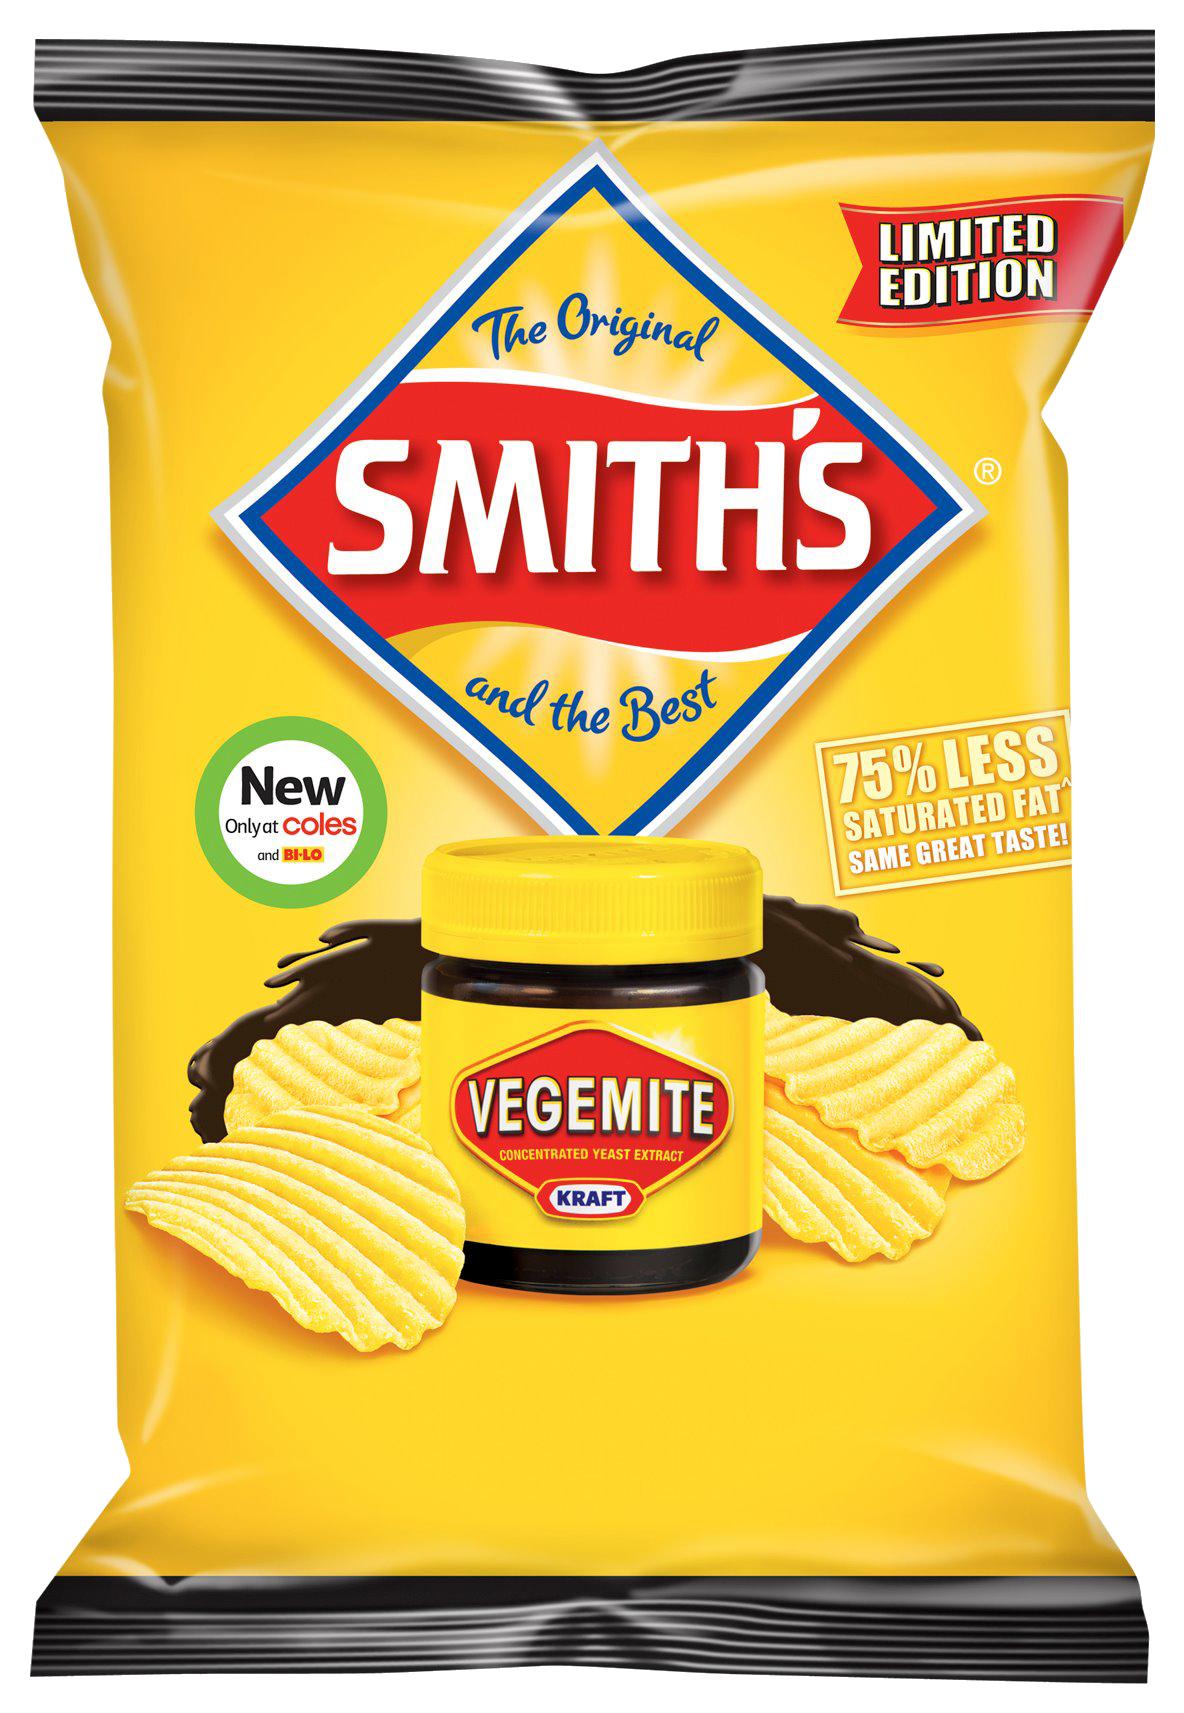 Vegemite flavour crisps